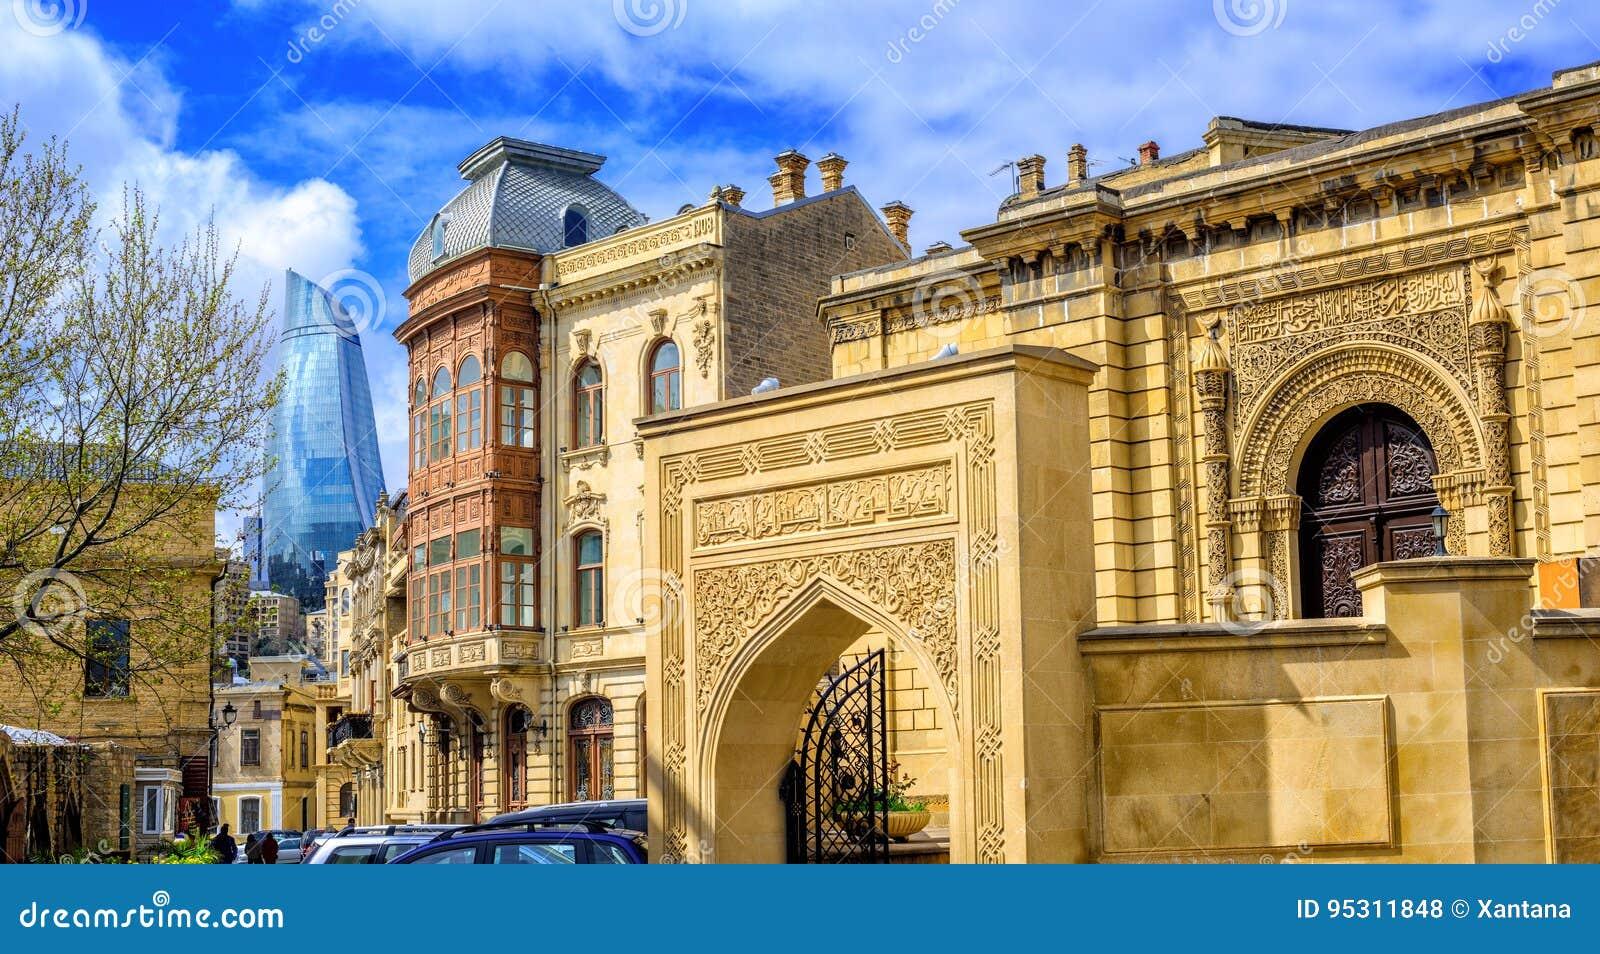 Baku Old Town, Azerbaijan